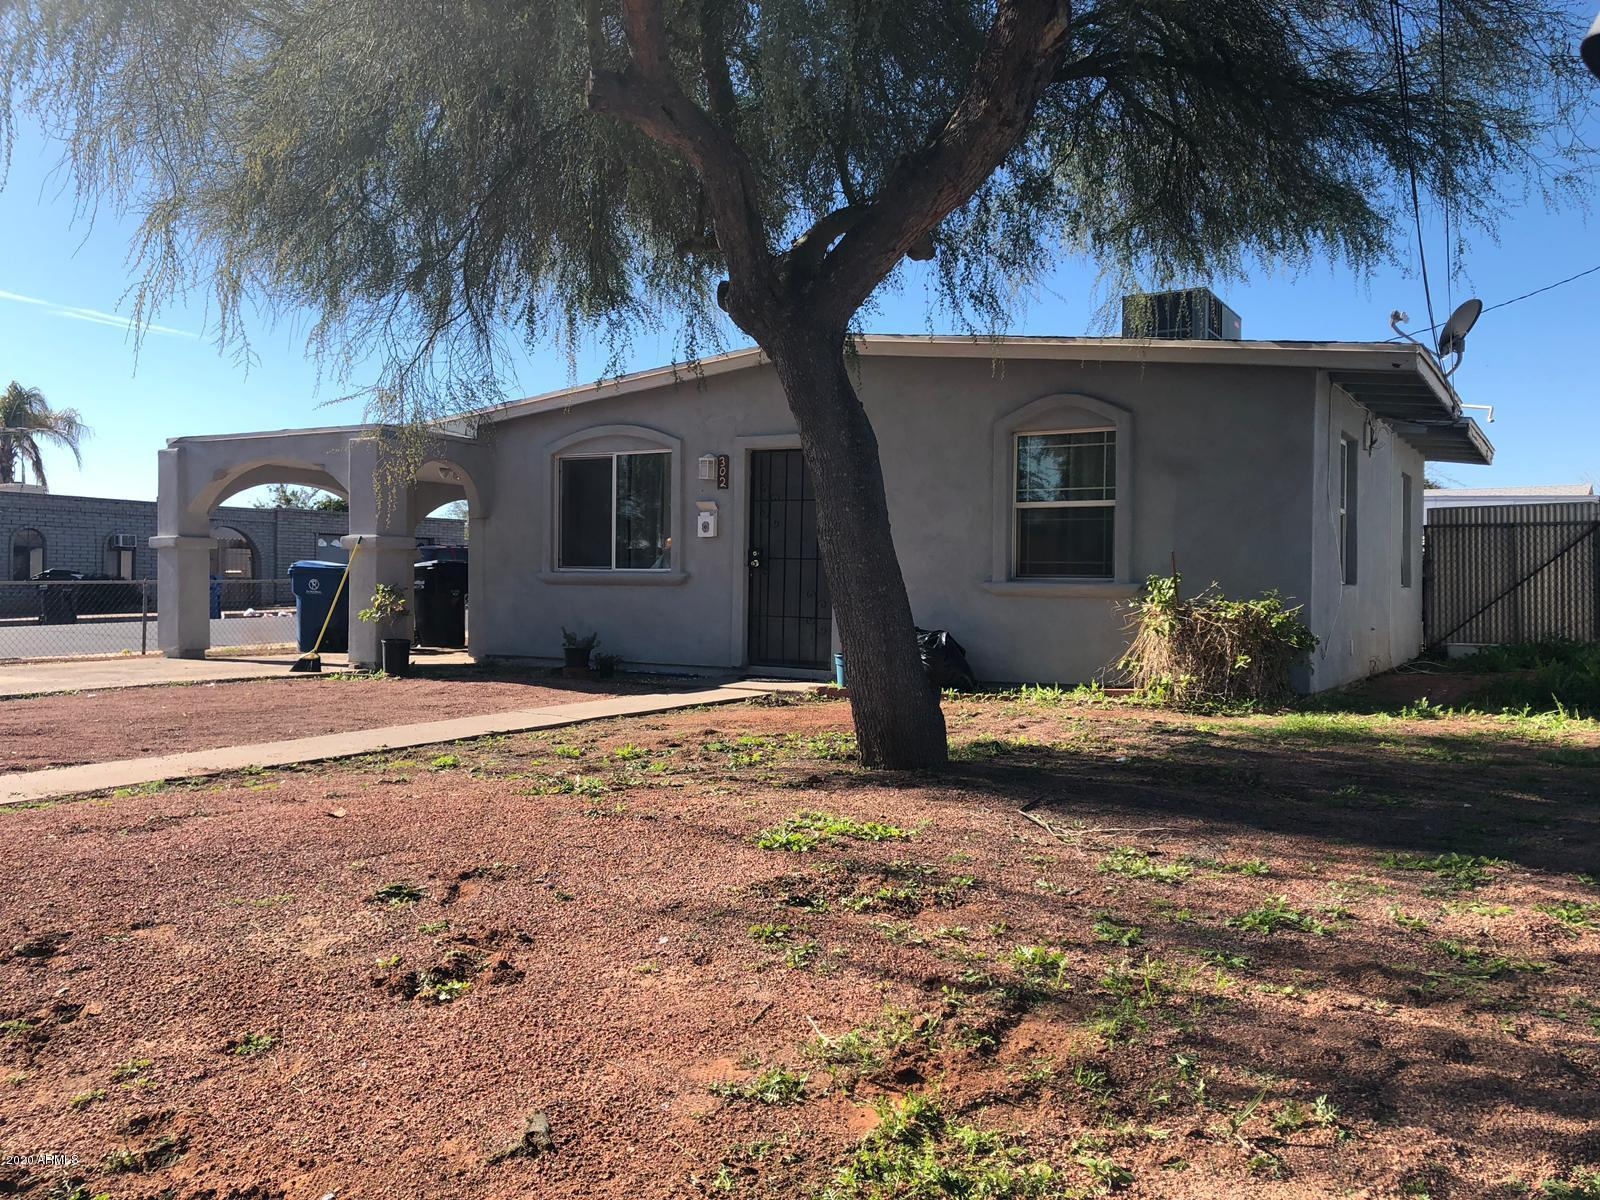 Photo of 302 N 5TH Street, Avondale, AZ 85323